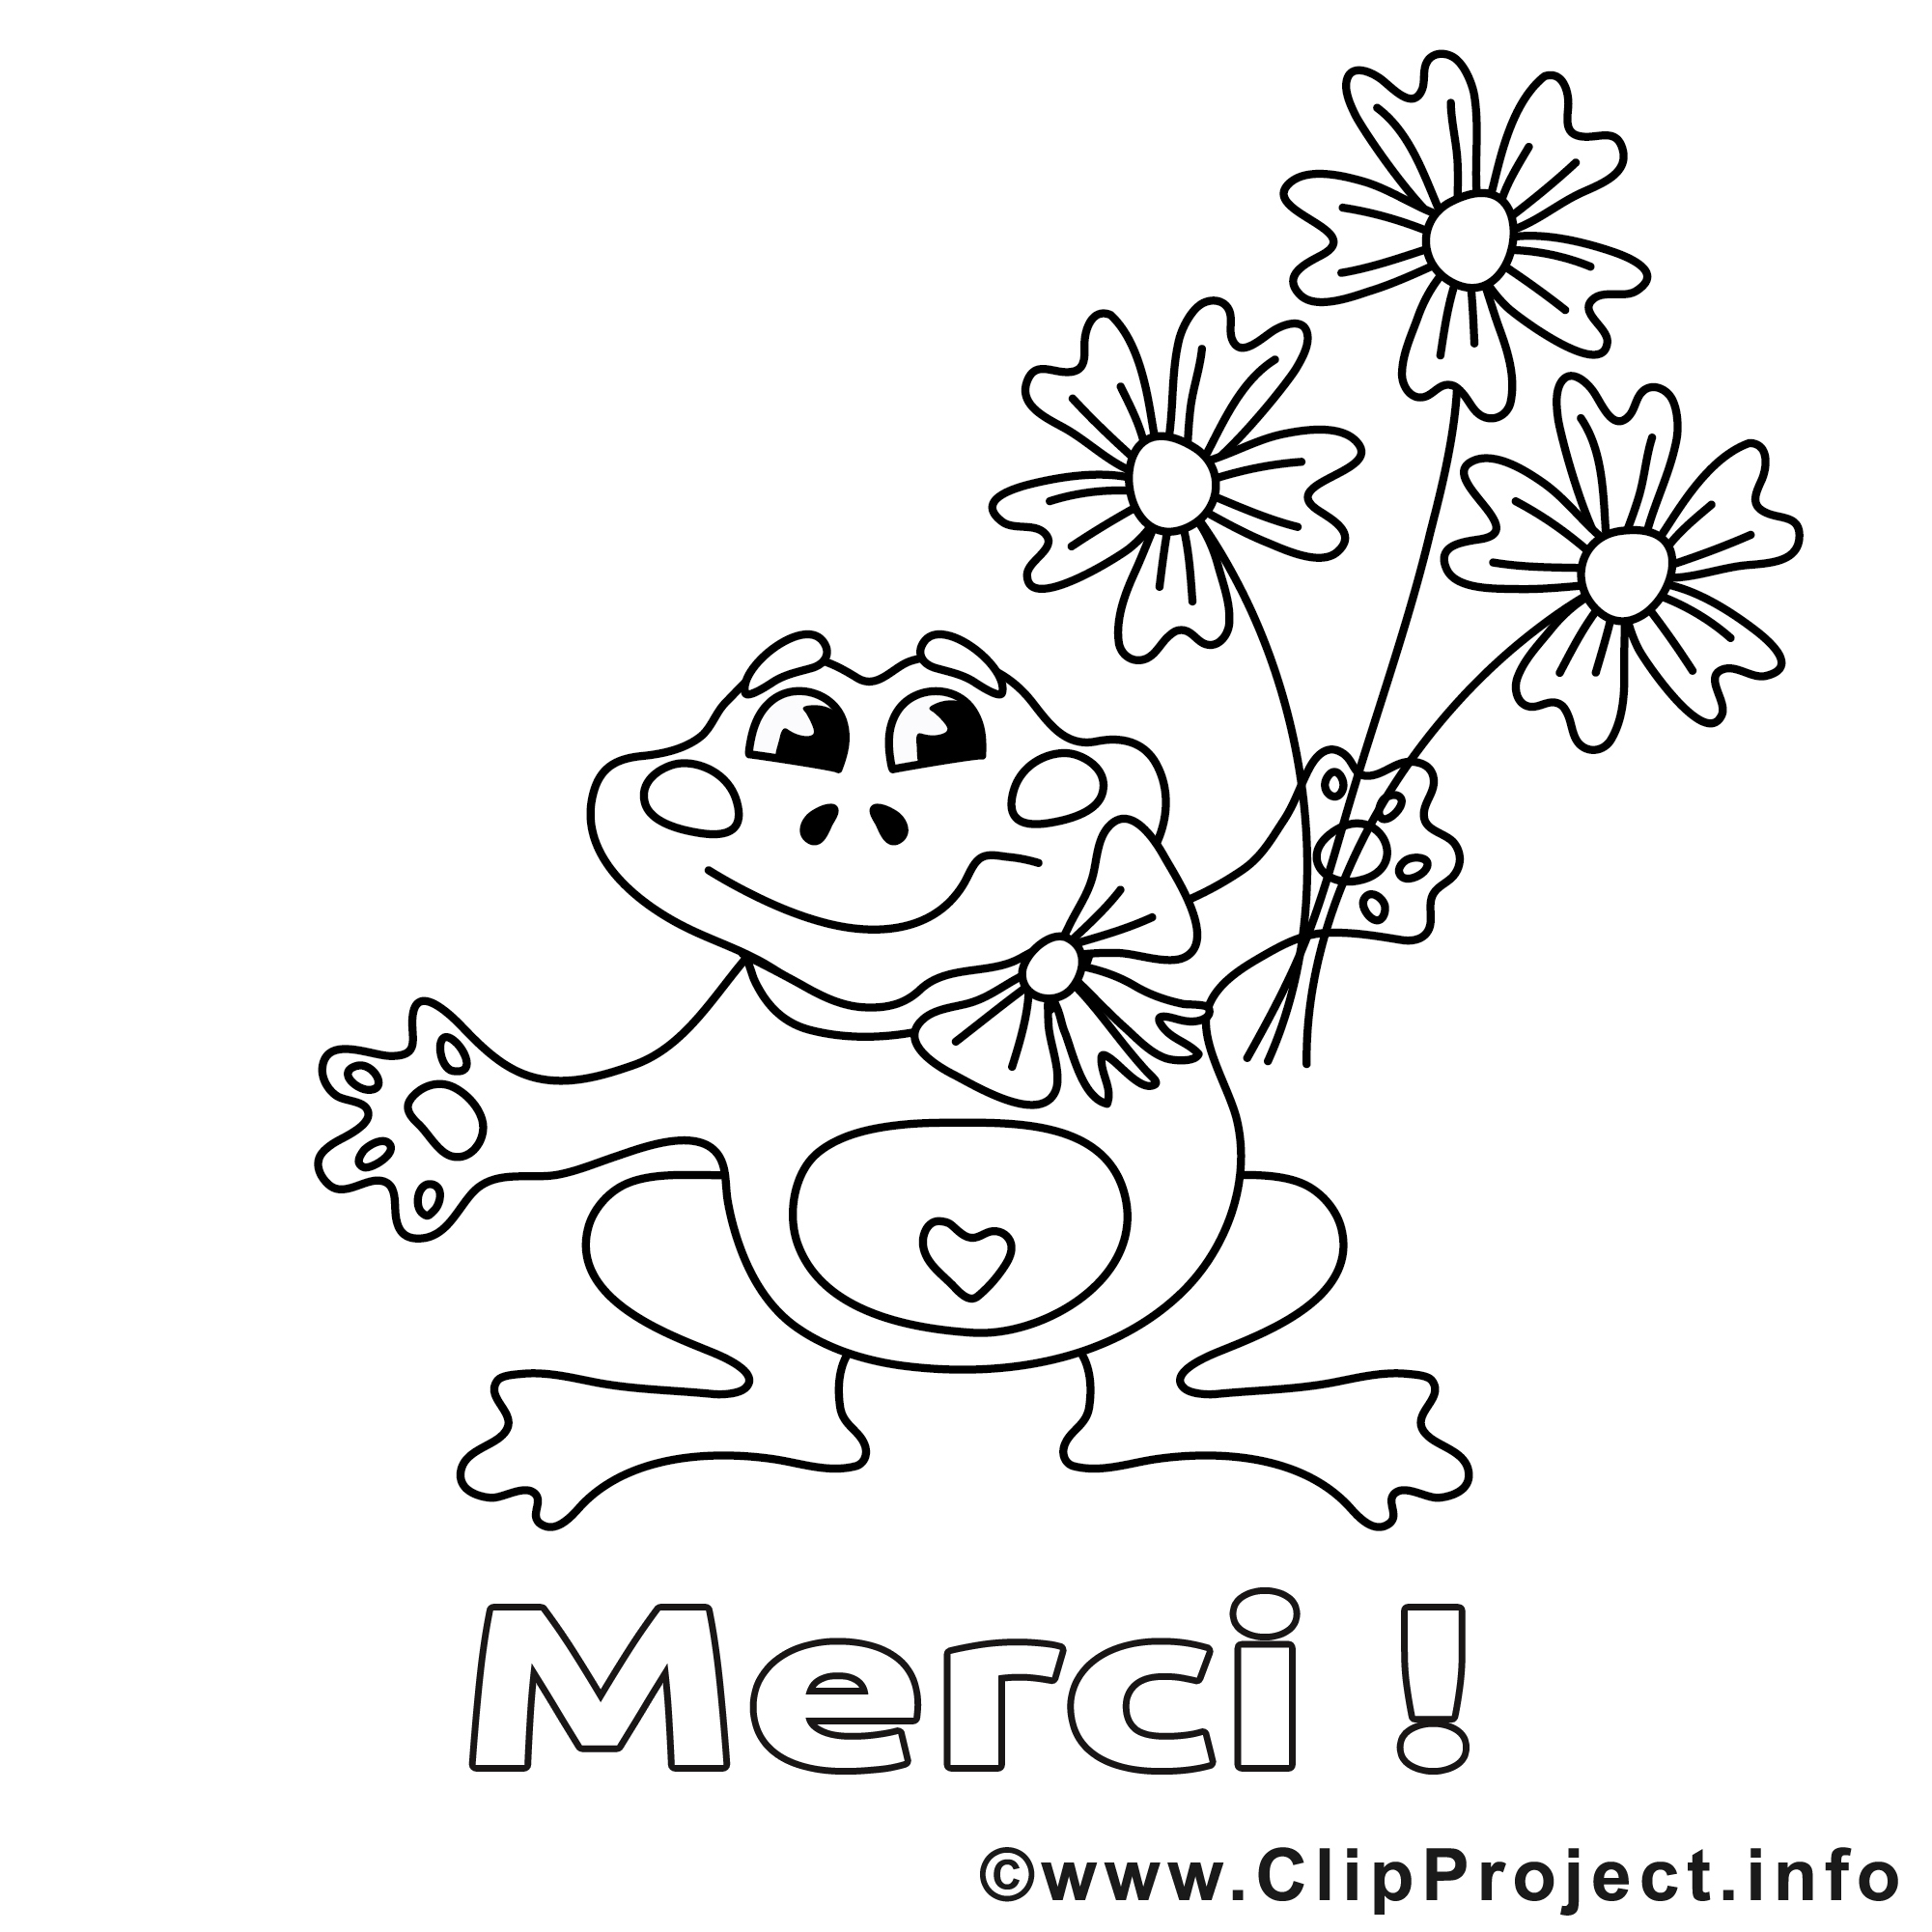 Grenouille image coloriage merci illustration merci - Image coloriage ...